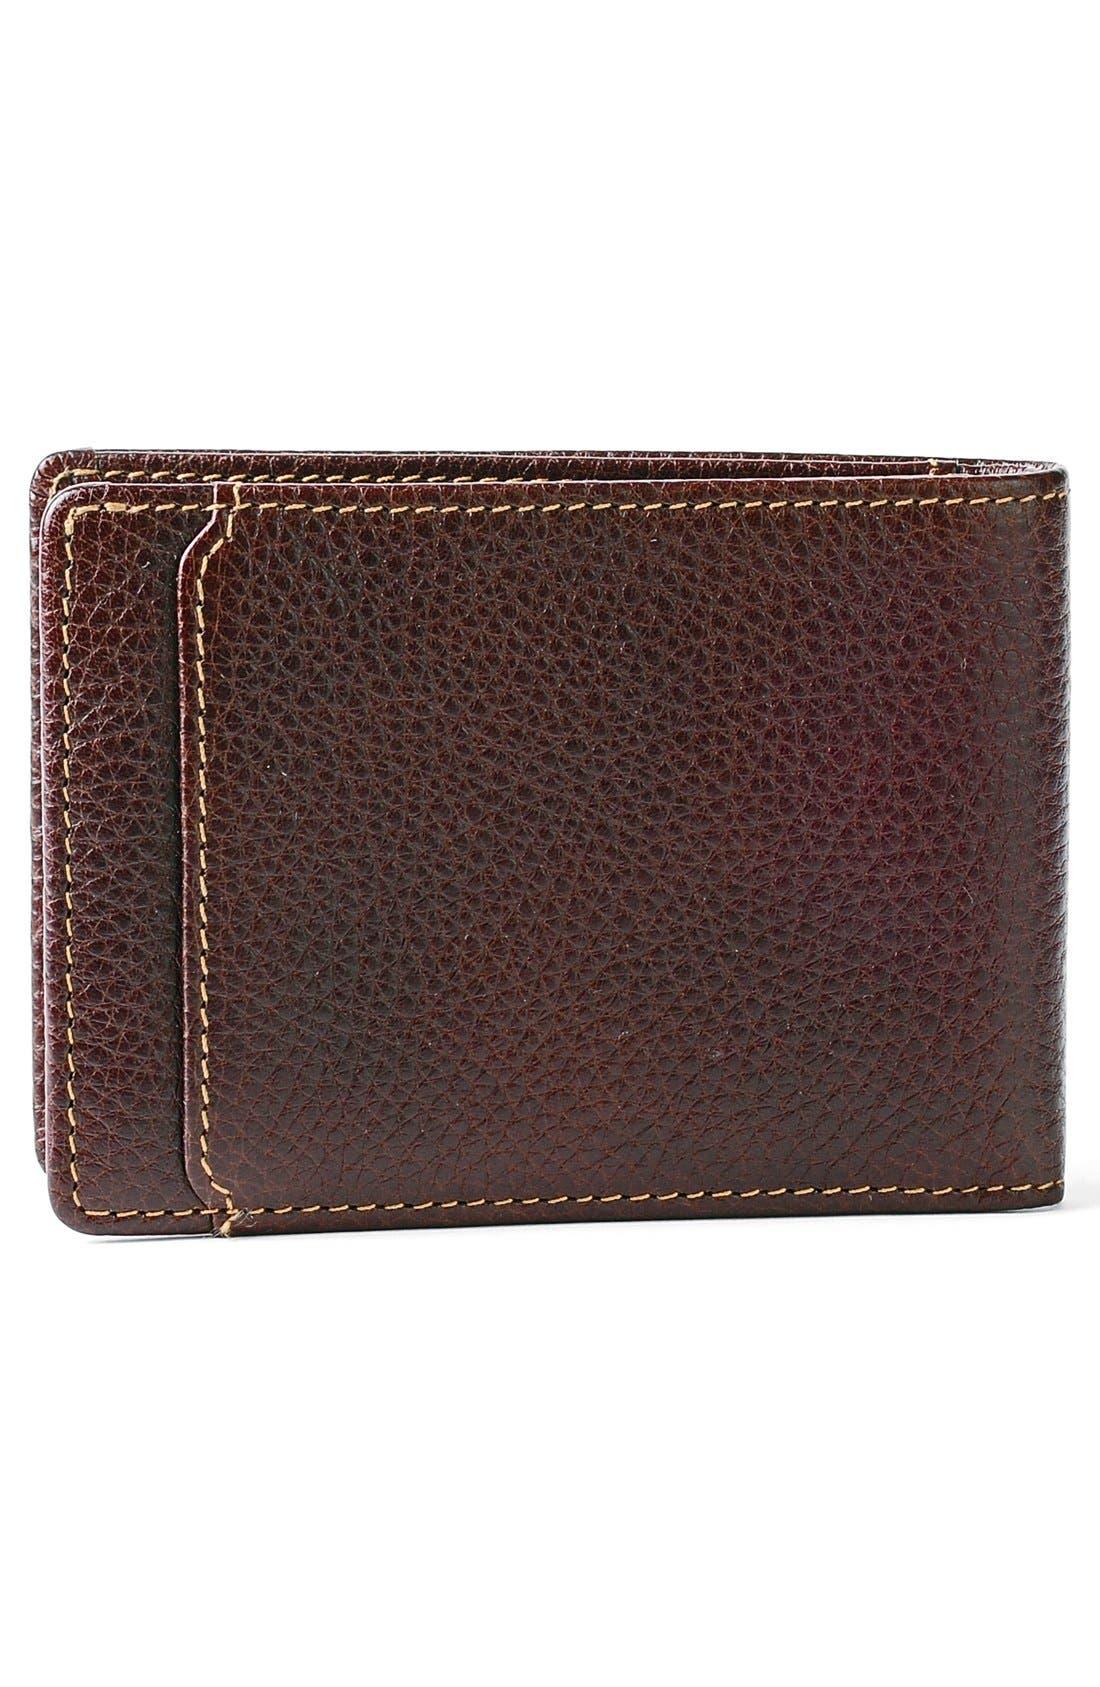 'Tyler' RFID Slimster Wallet,                             Alternate thumbnail 3, color,                             Coffee